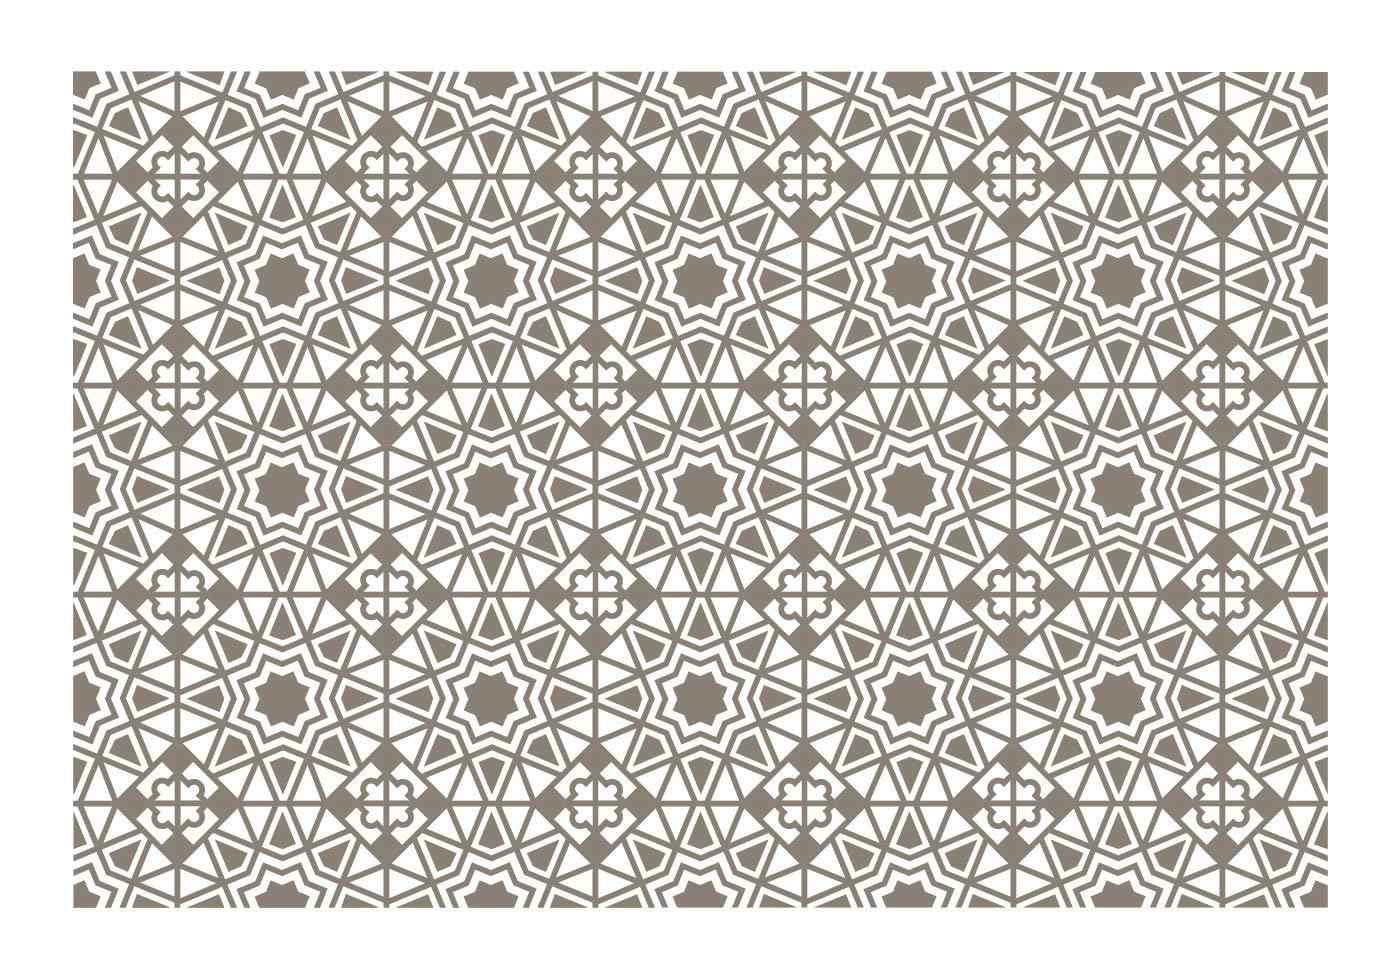 Islamic Pattern Free Vector Art - (37,214 Free Downloads)